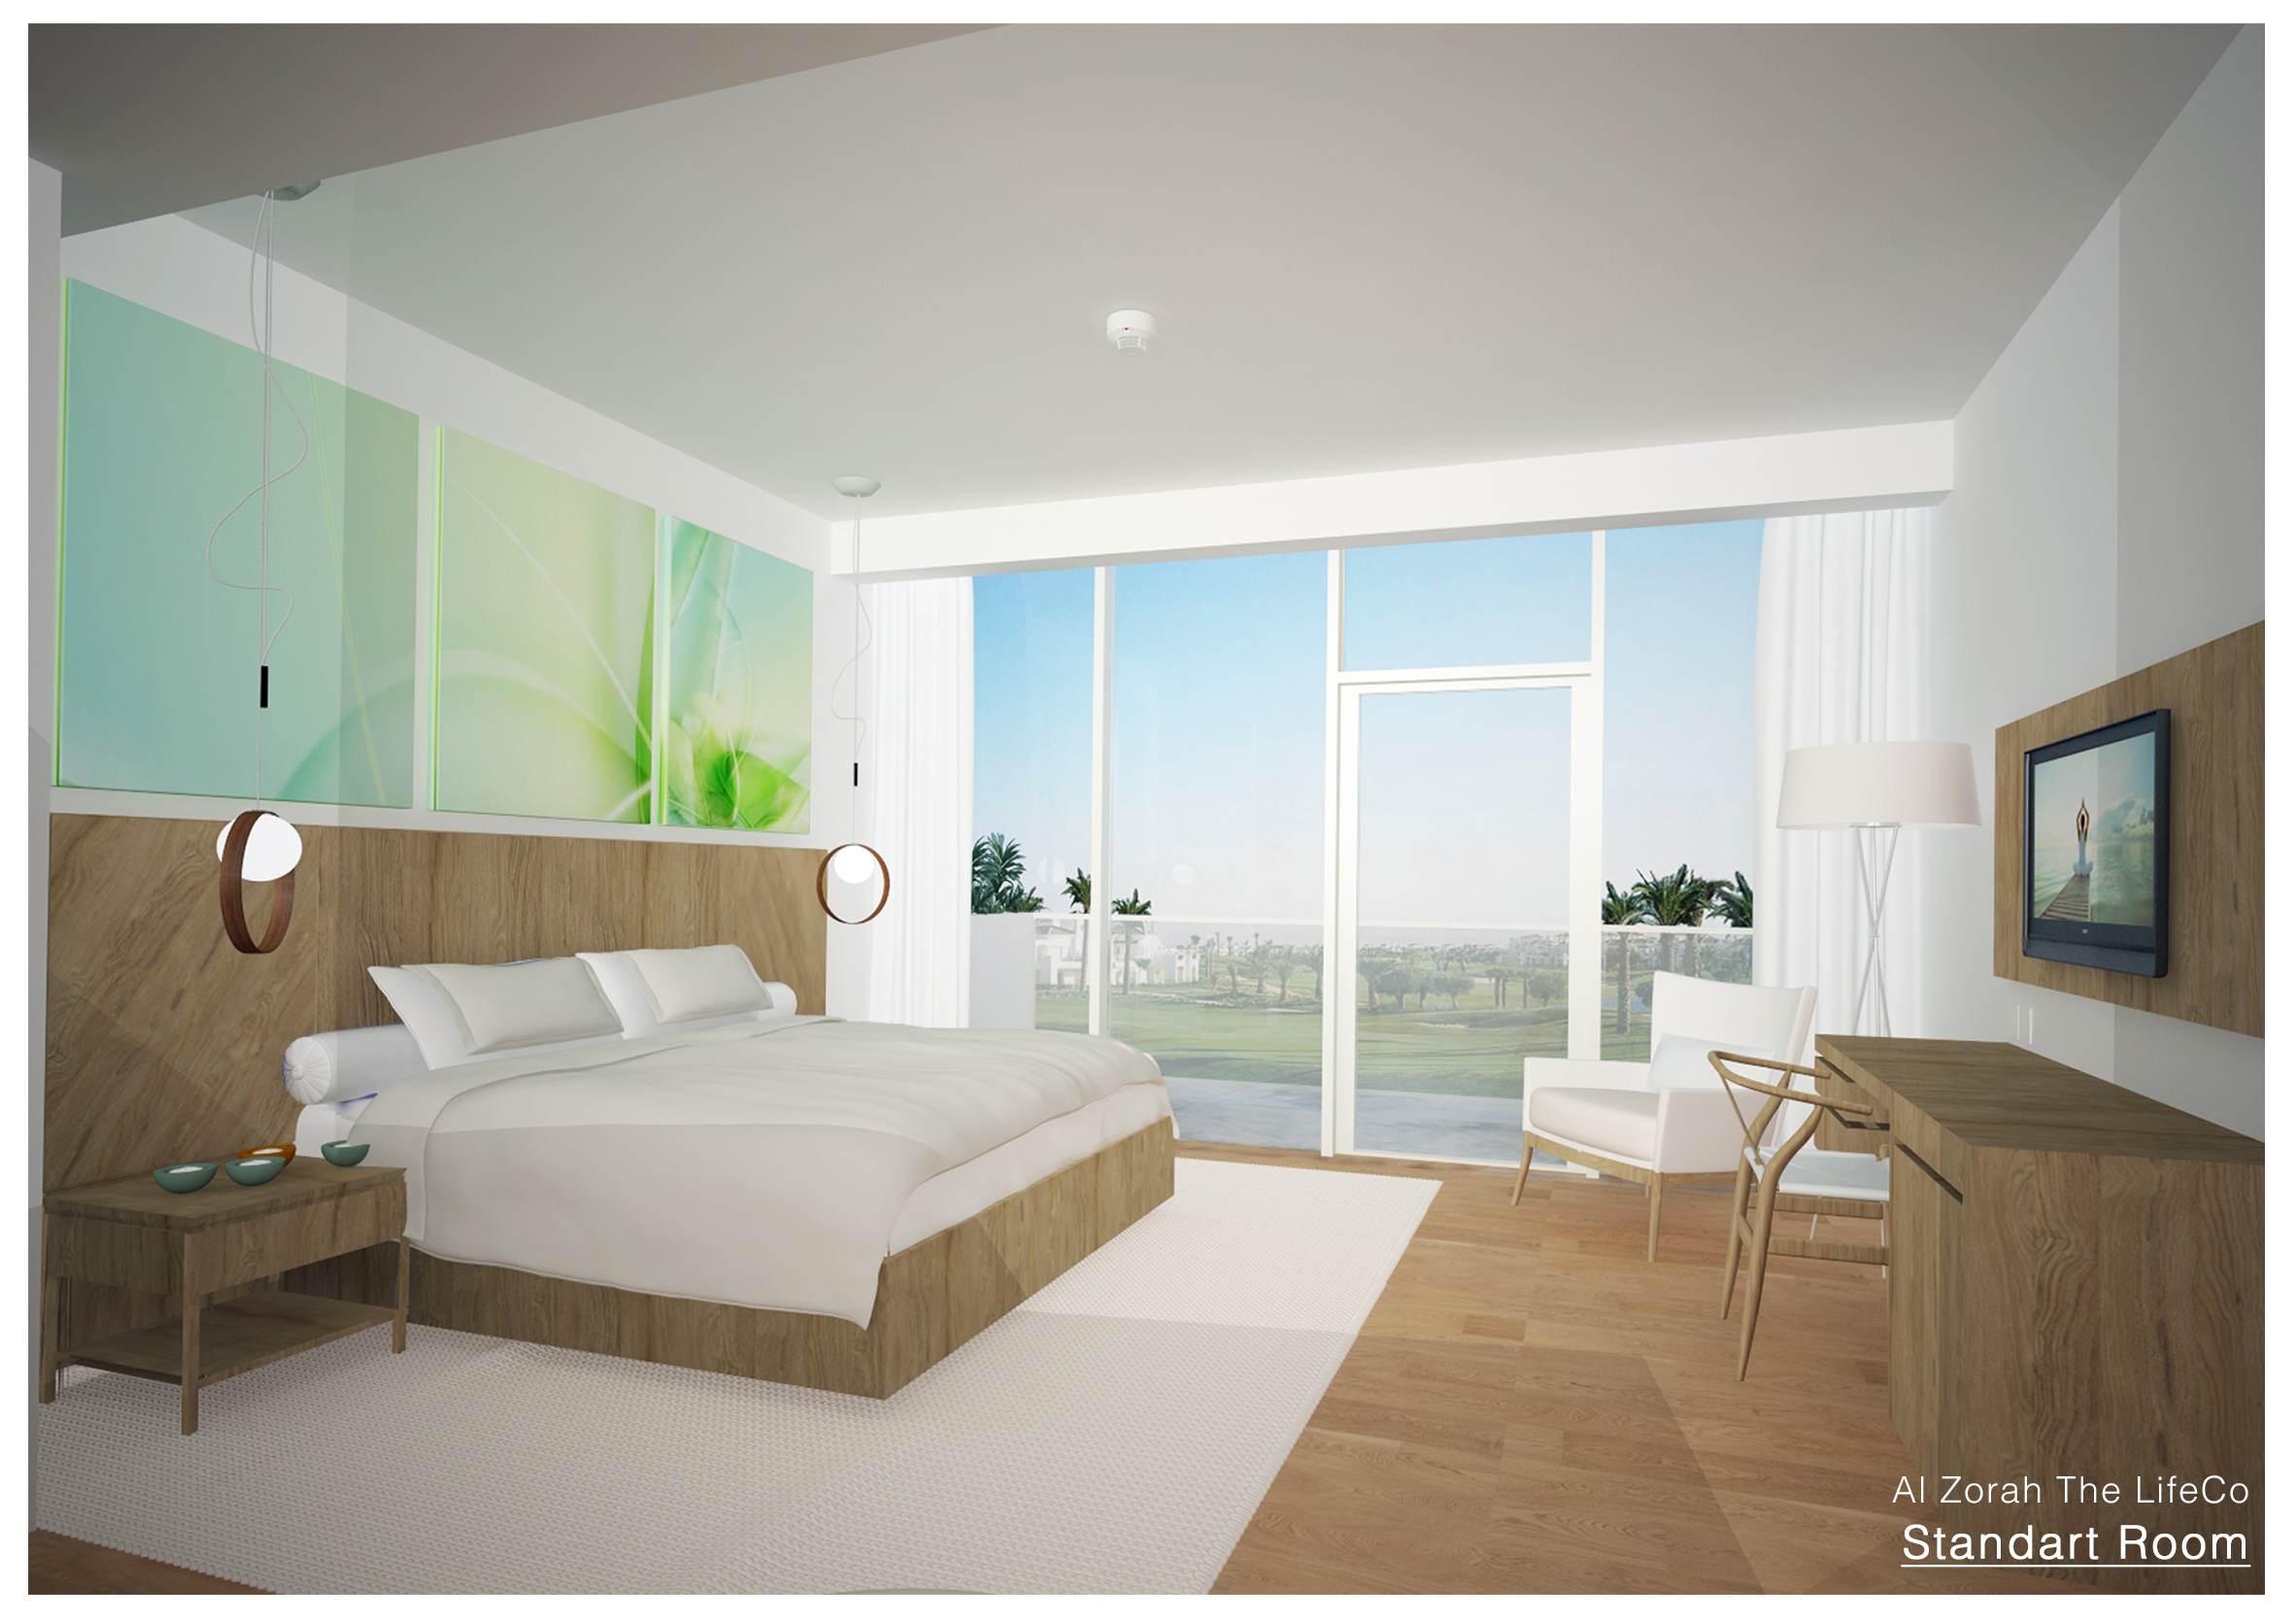 01_standart-room-1